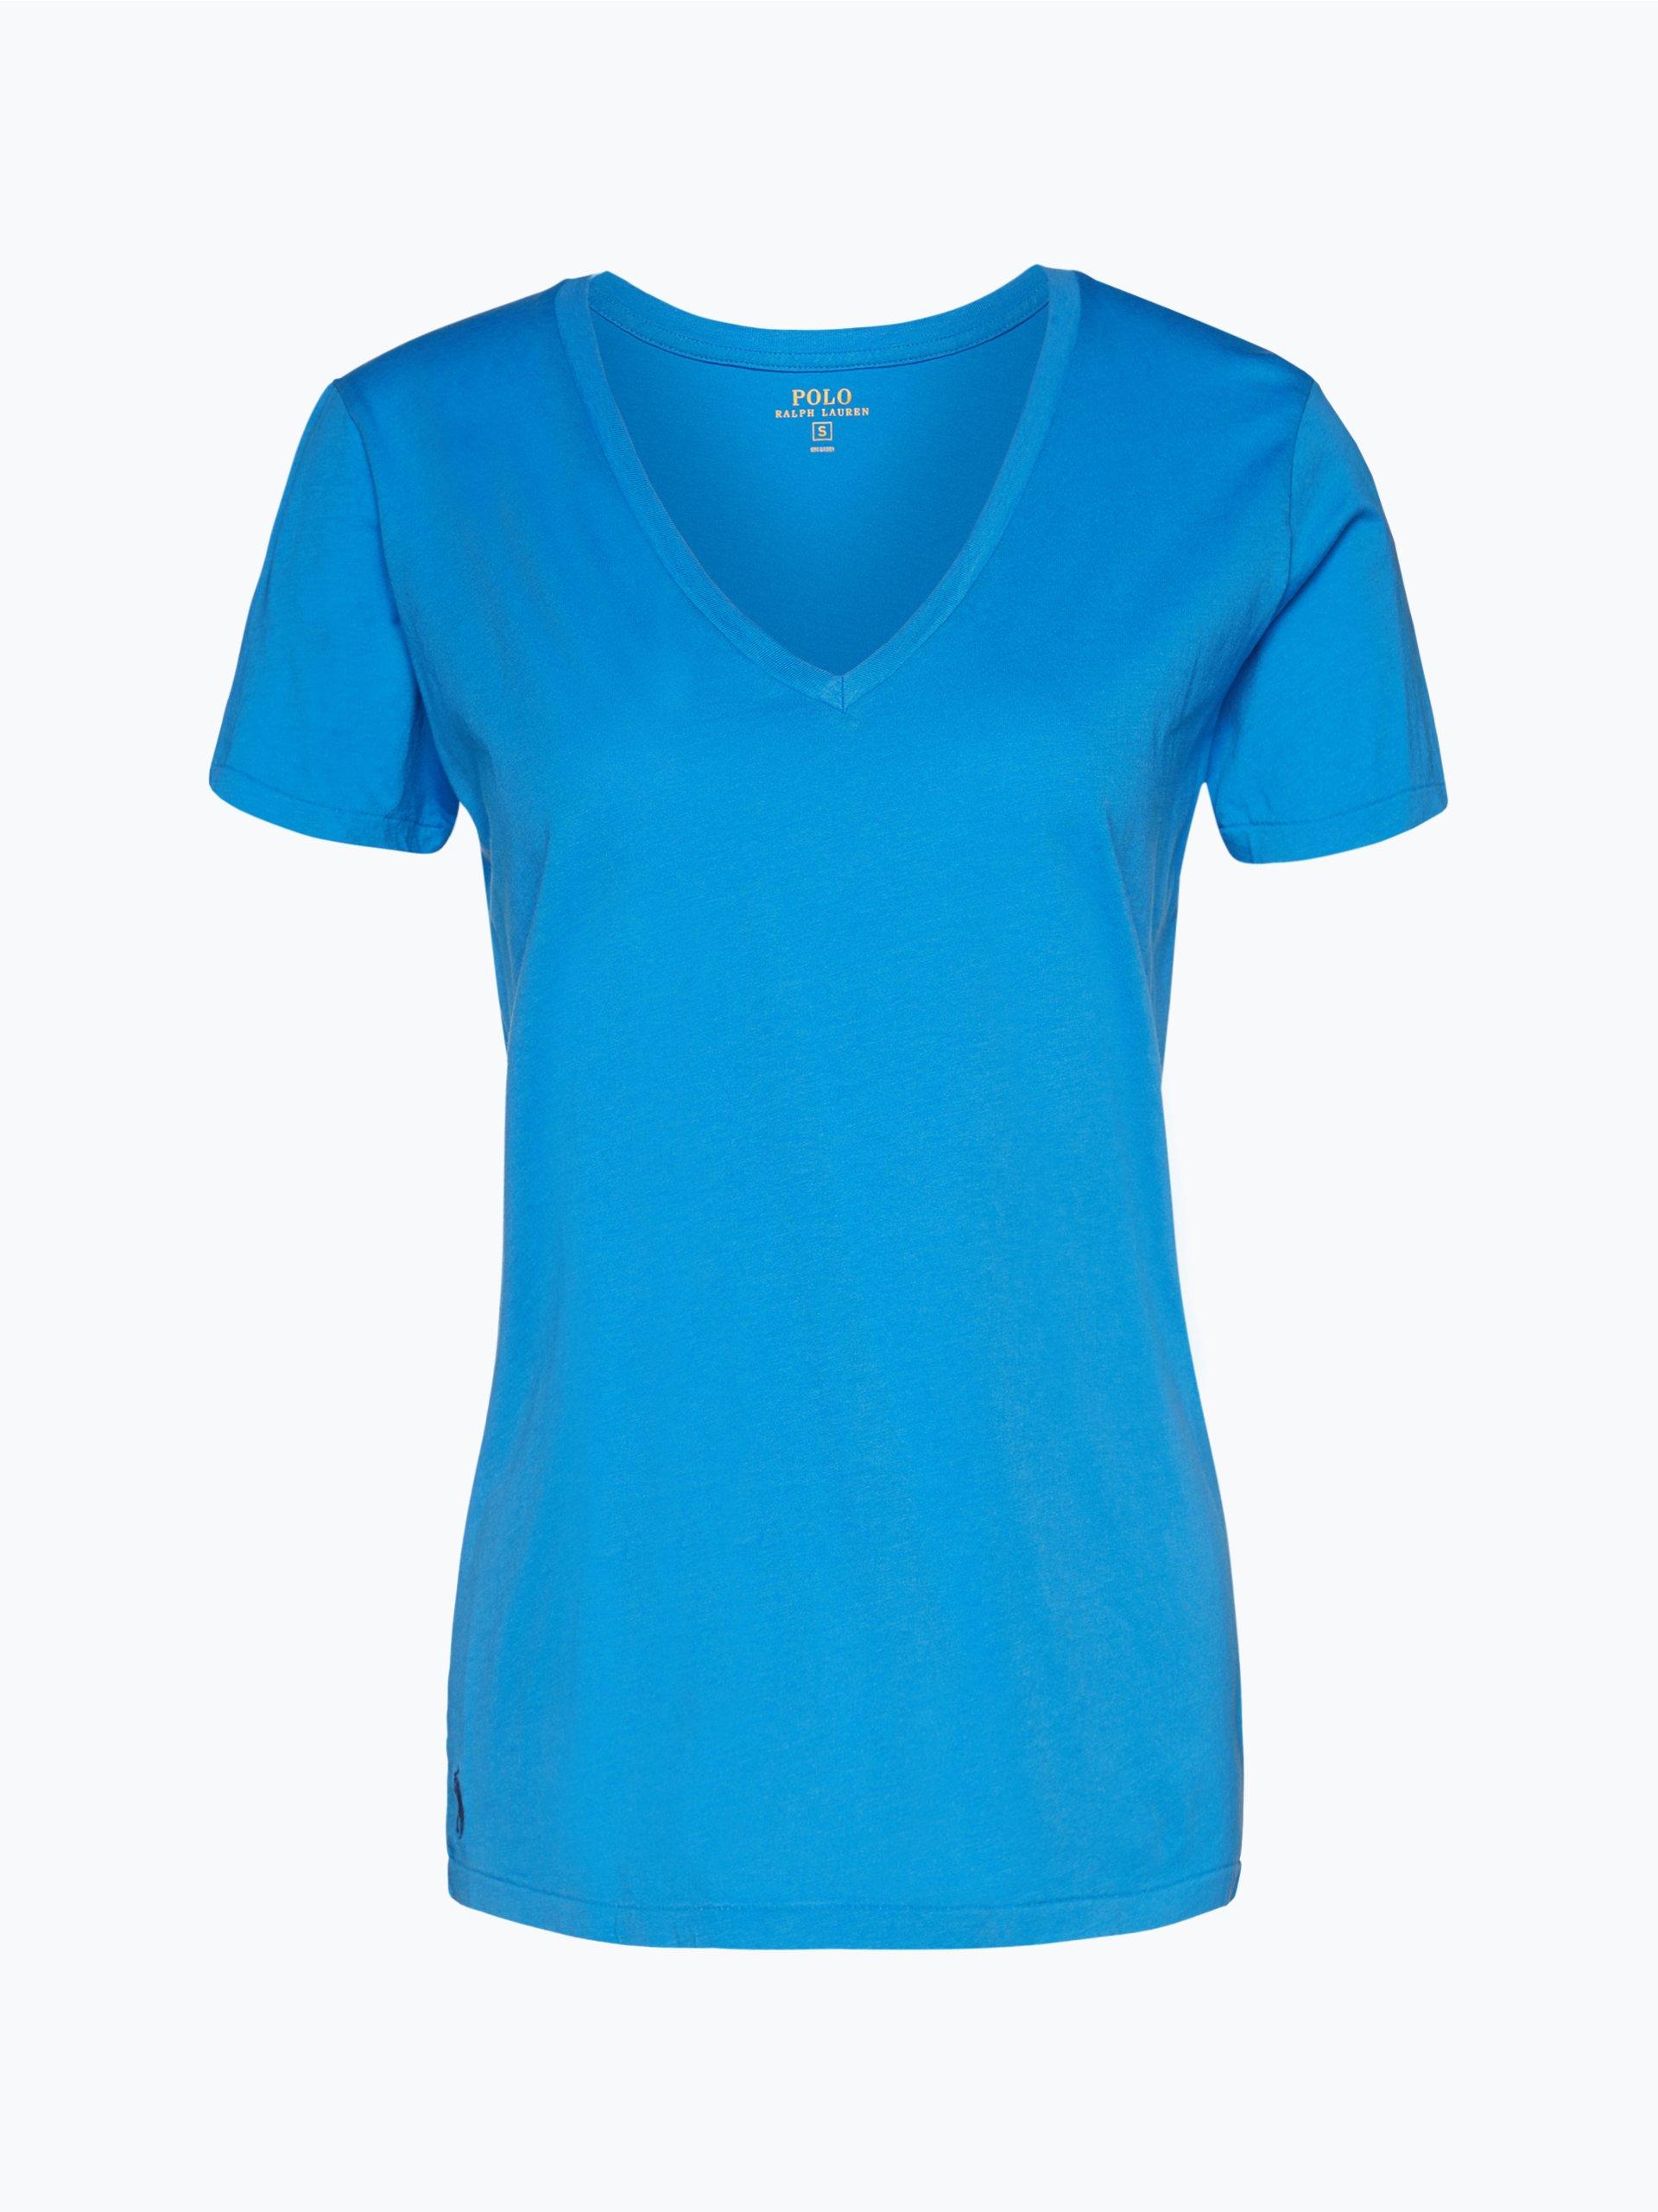 polo ralph lauren damen t shirt royal uni online kaufen vangraaf com. Black Bedroom Furniture Sets. Home Design Ideas